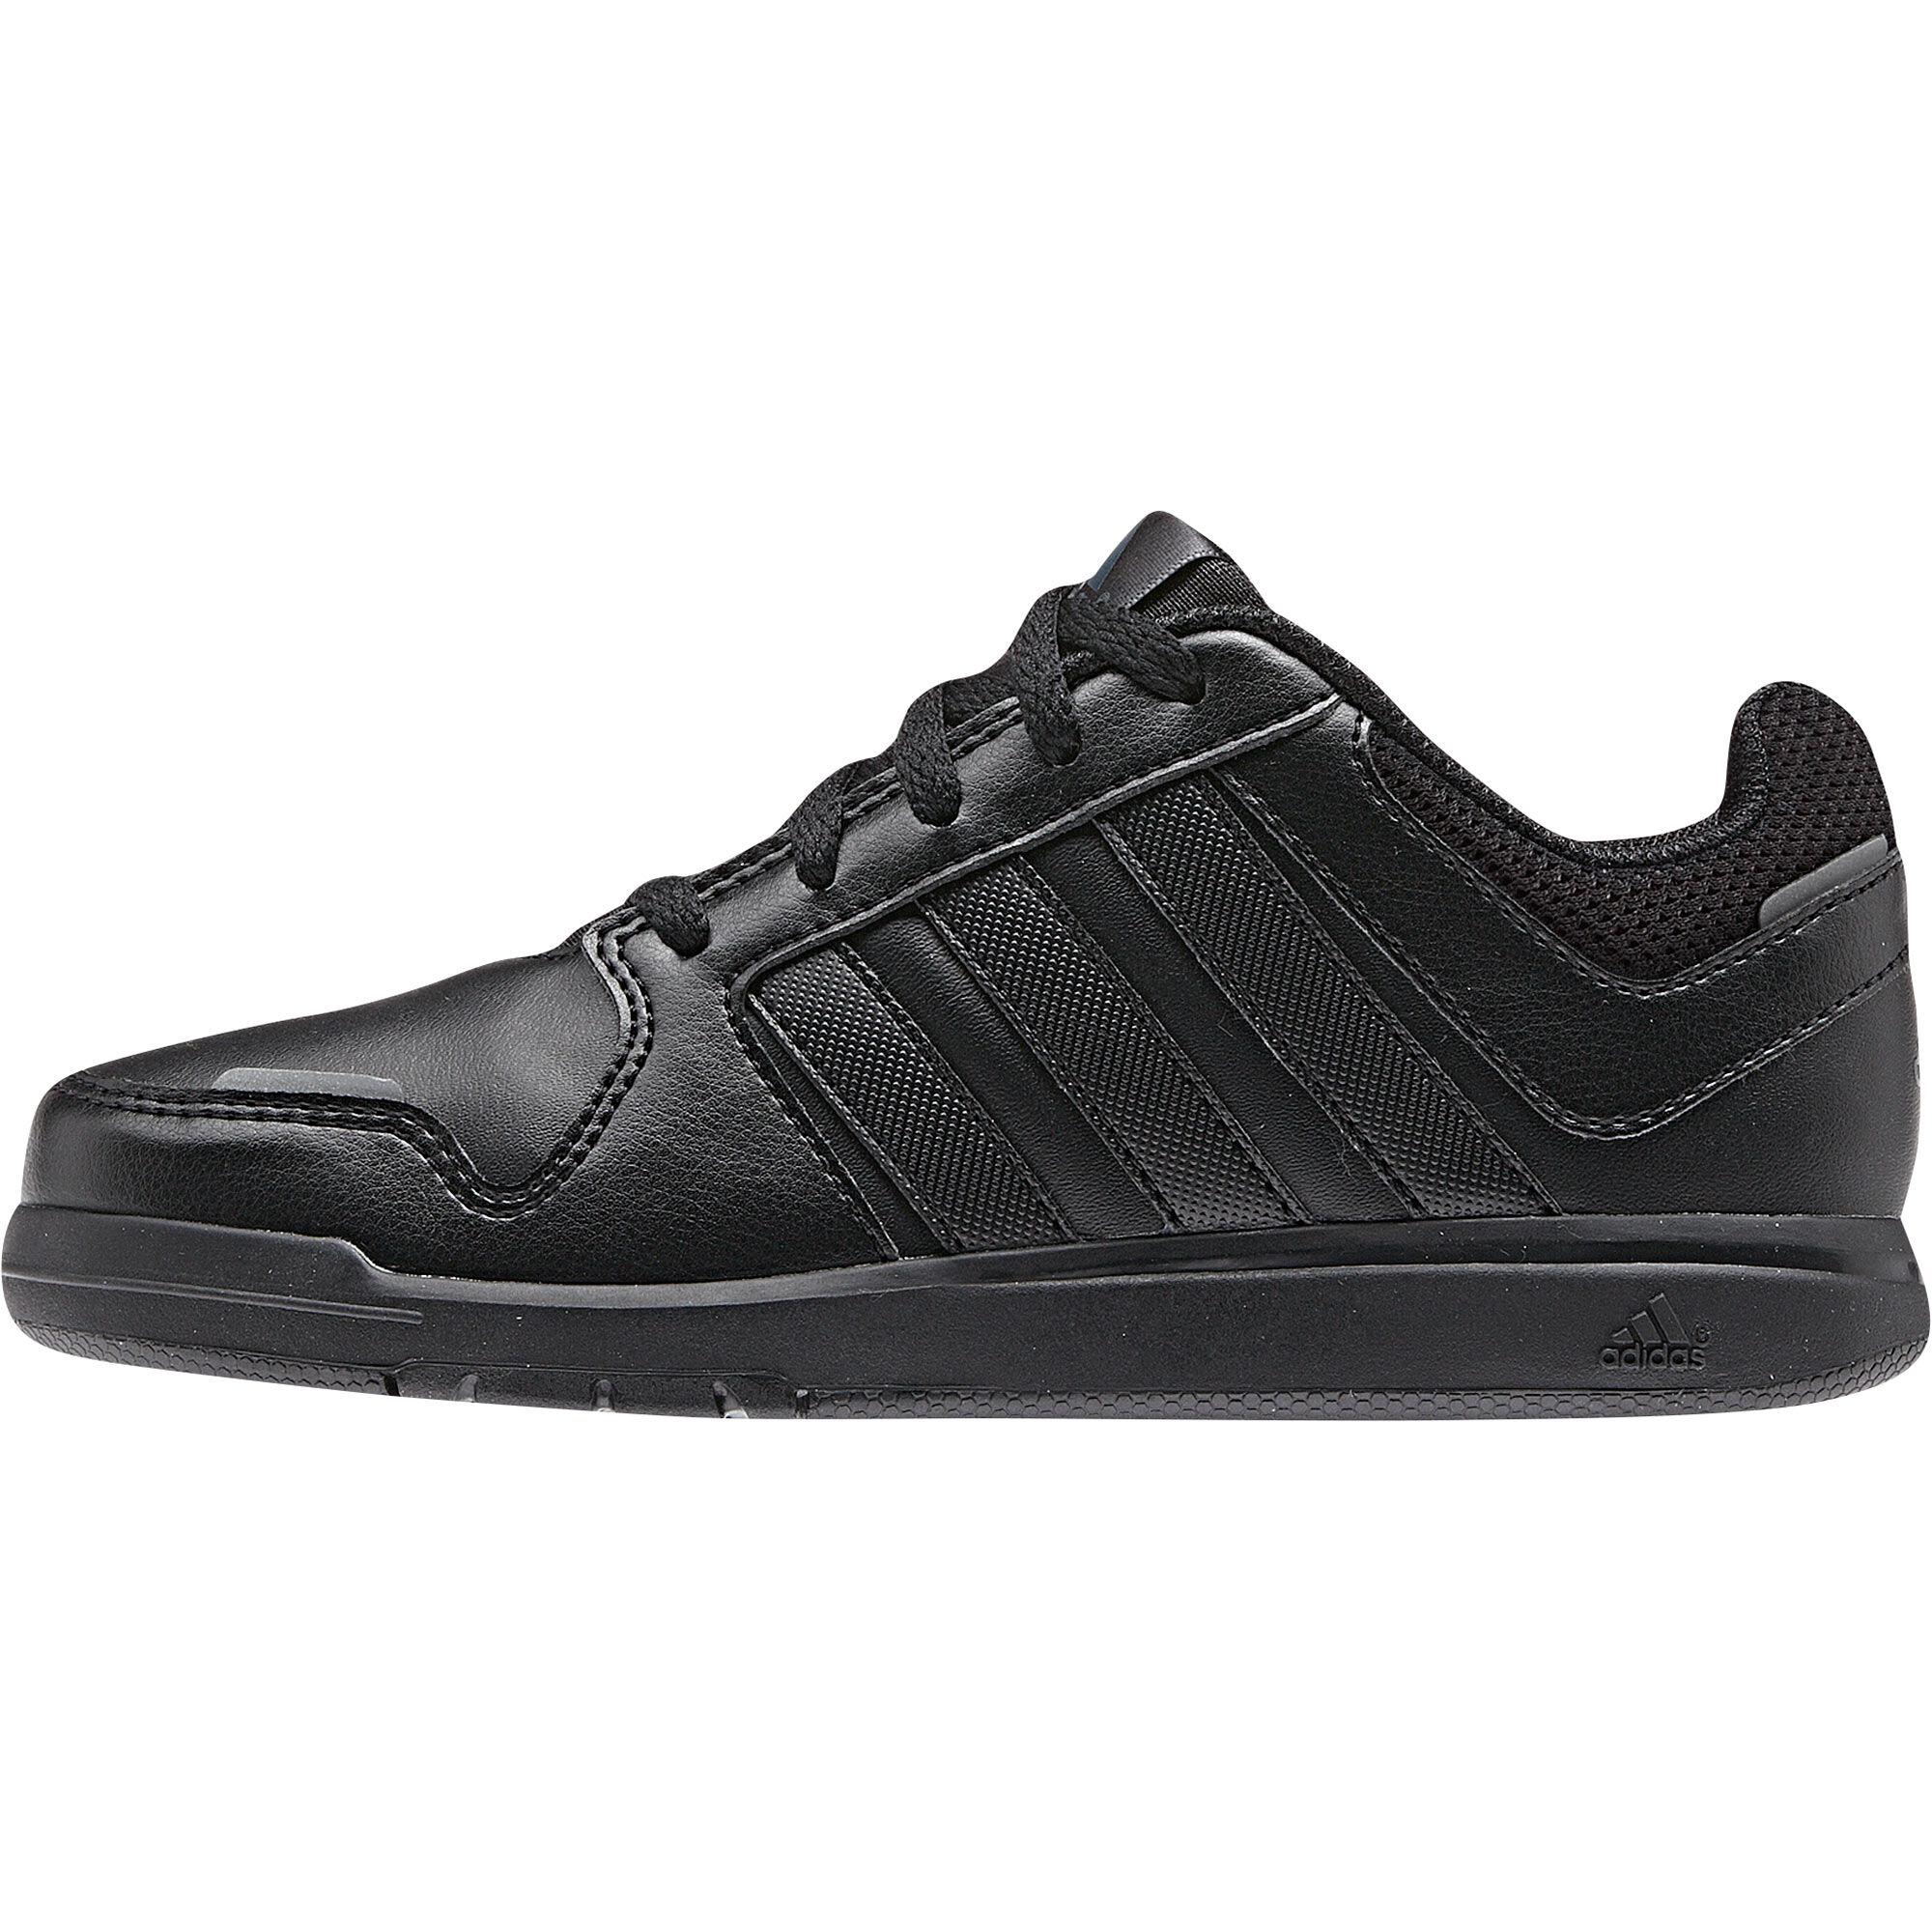 zapatillas adidas negras para niños,adidas negras blancas ...